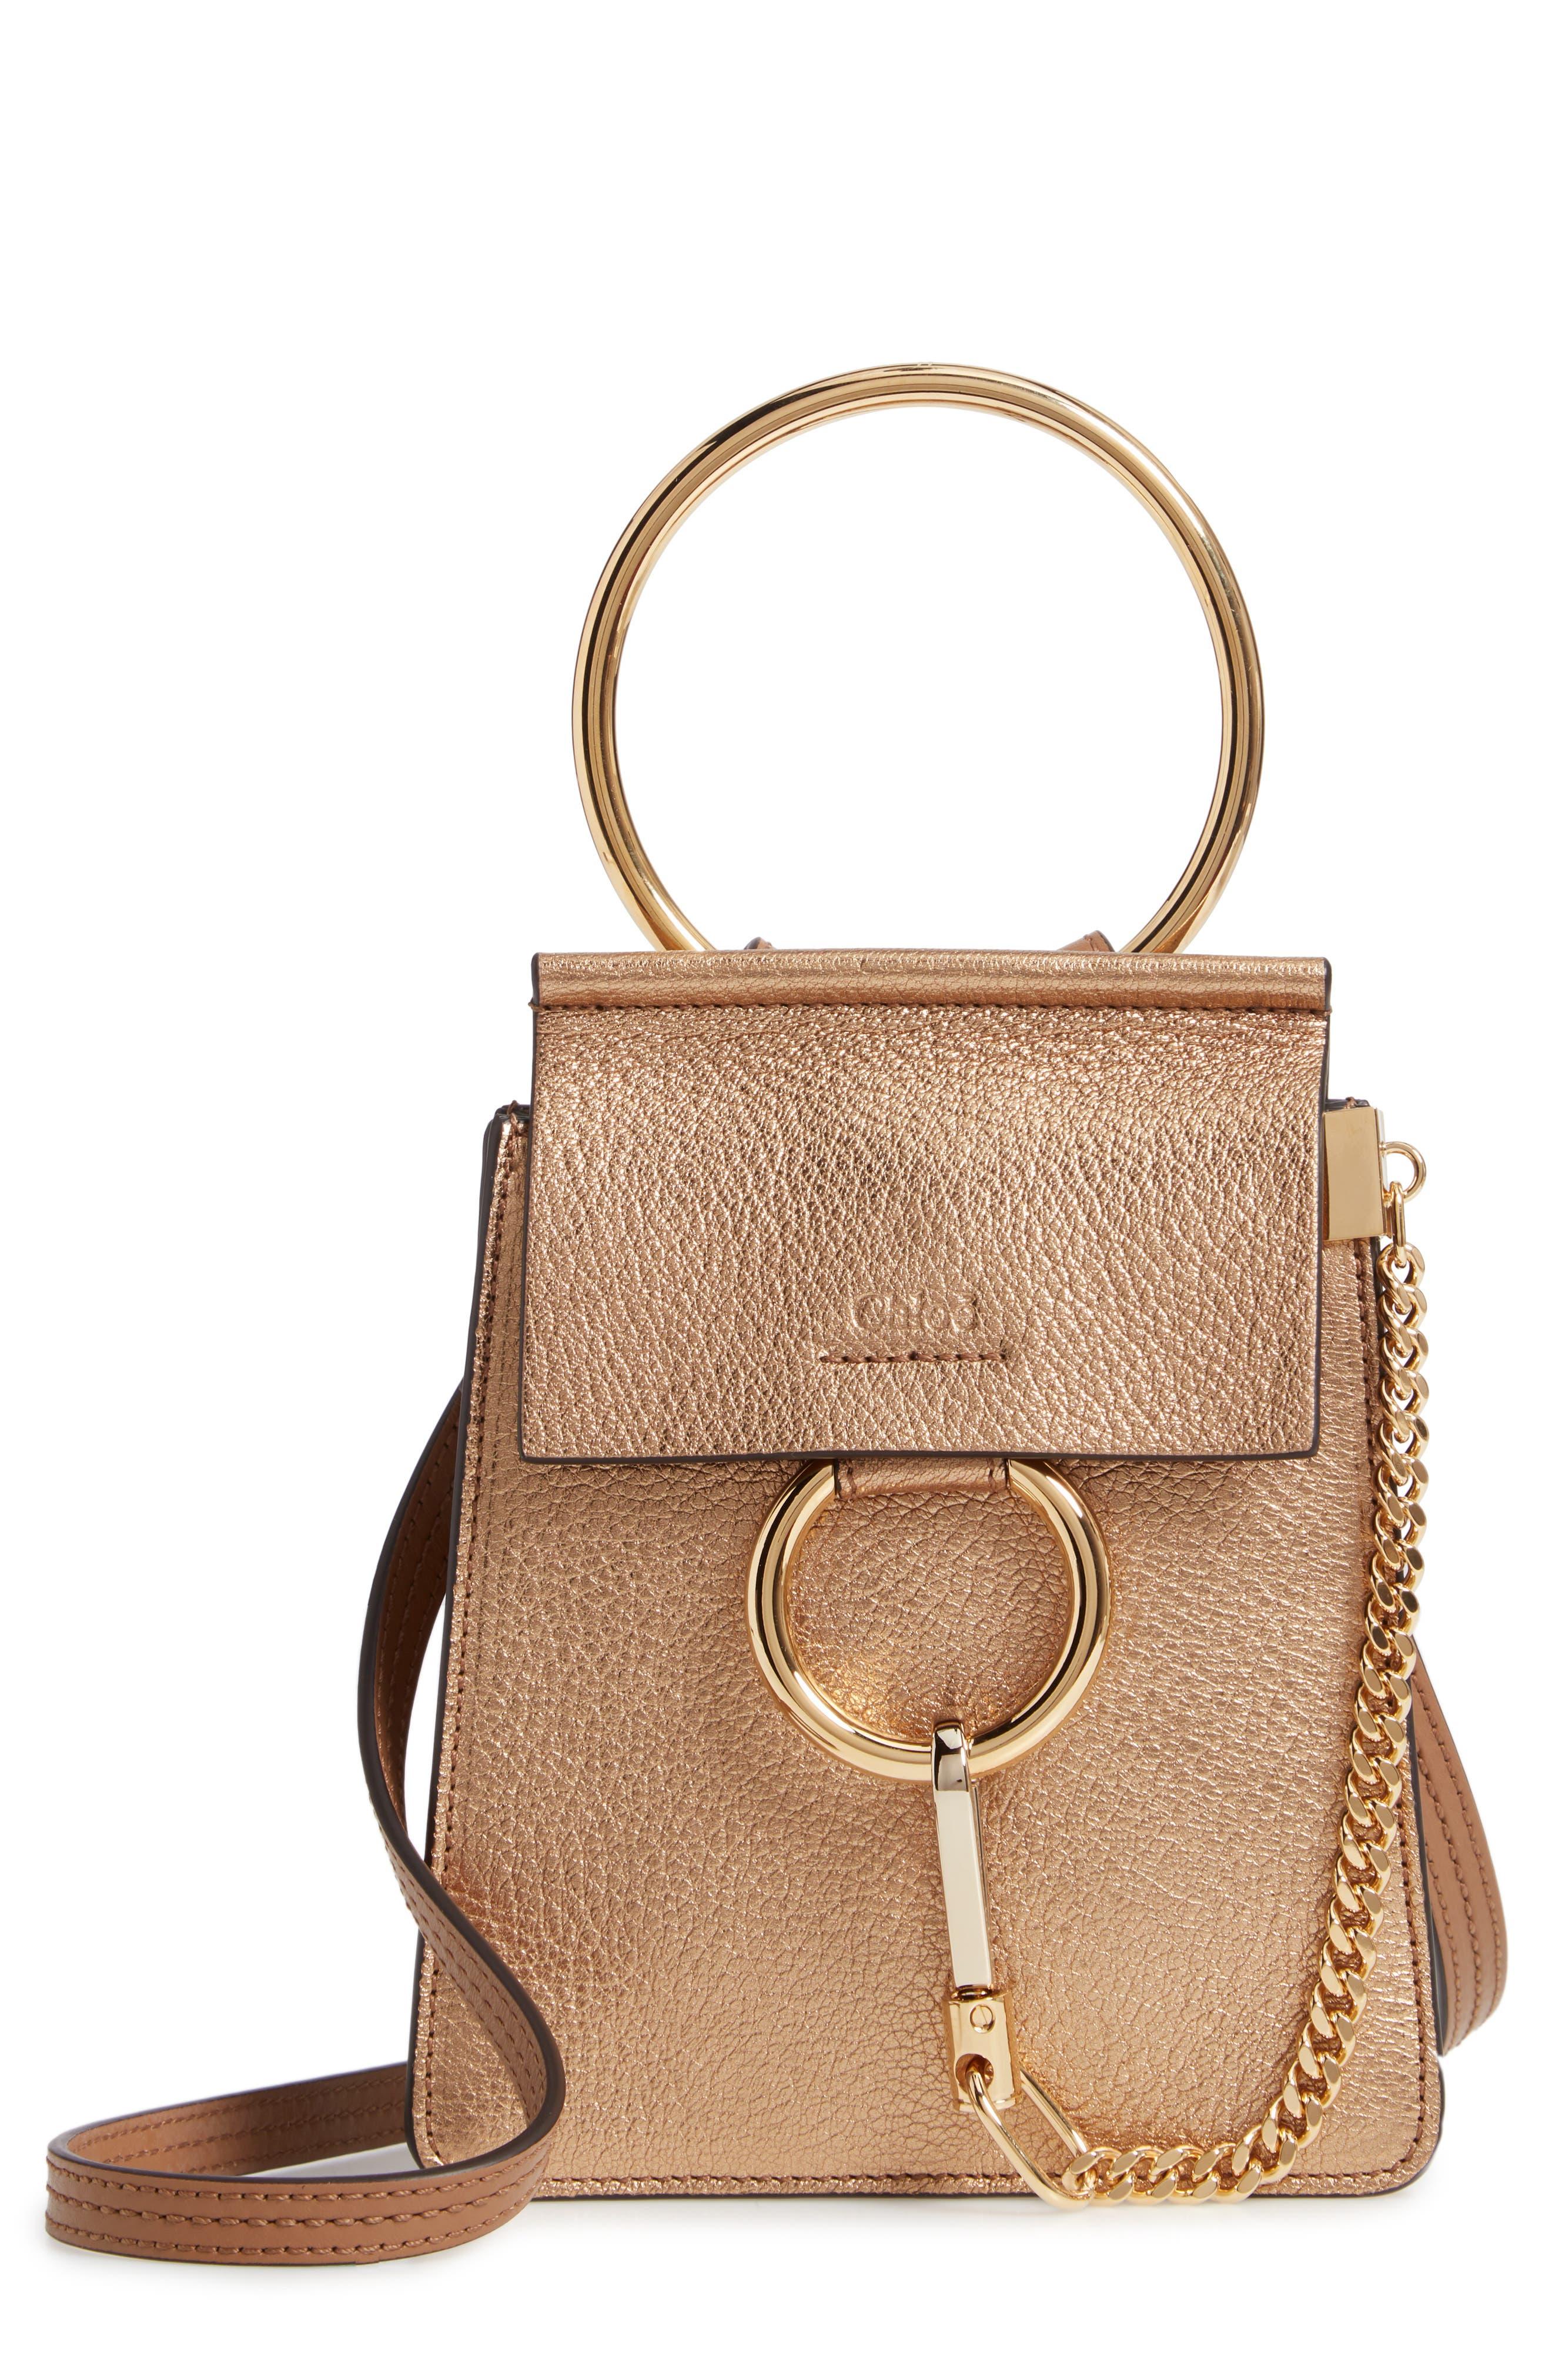 Faye Small Metallic Leather Bracelet Bag,                             Main thumbnail 1, color,                             GOLD